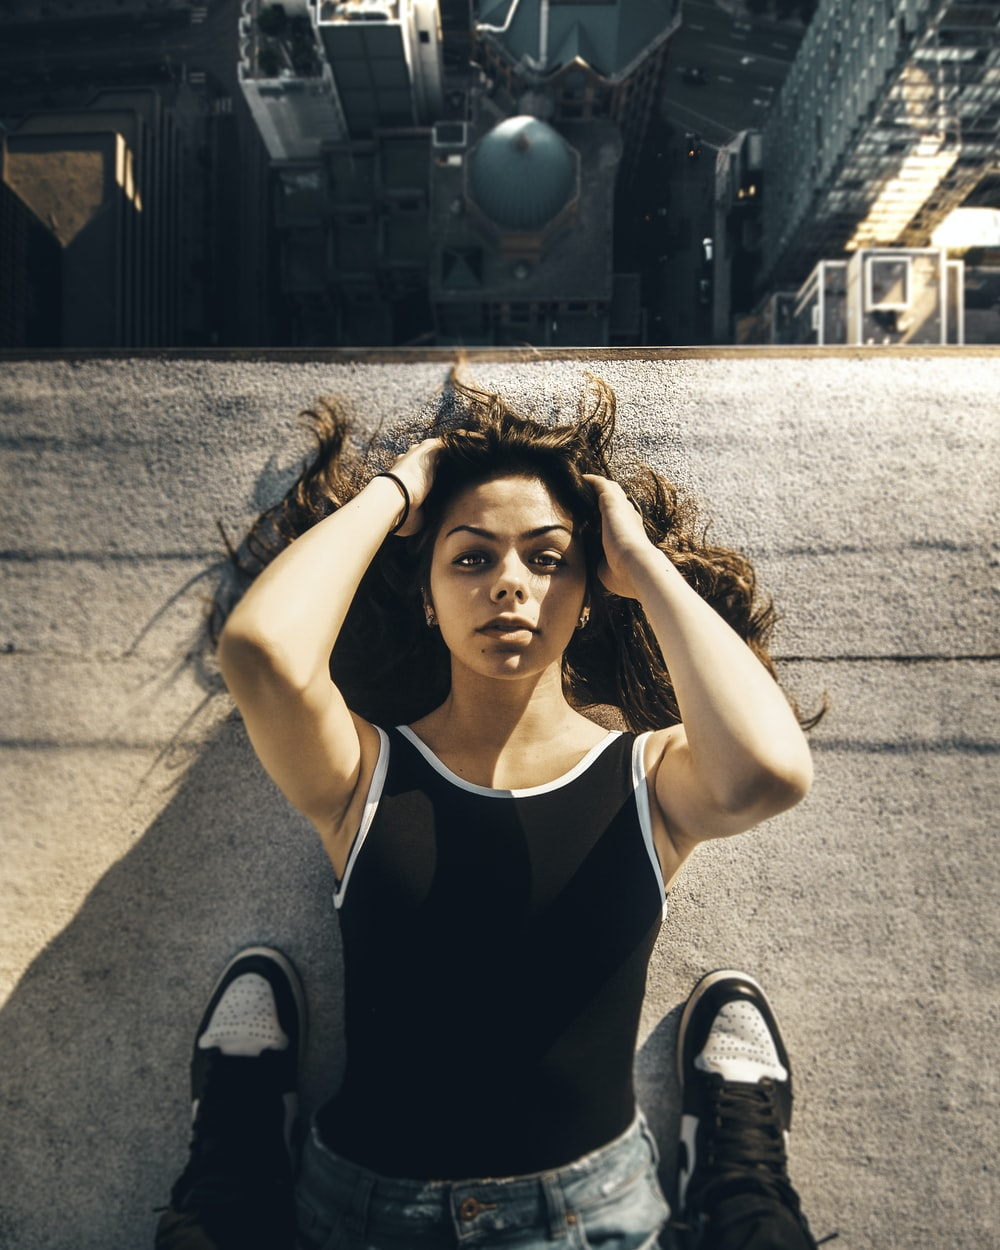 woman lying on gray flooring near buildings